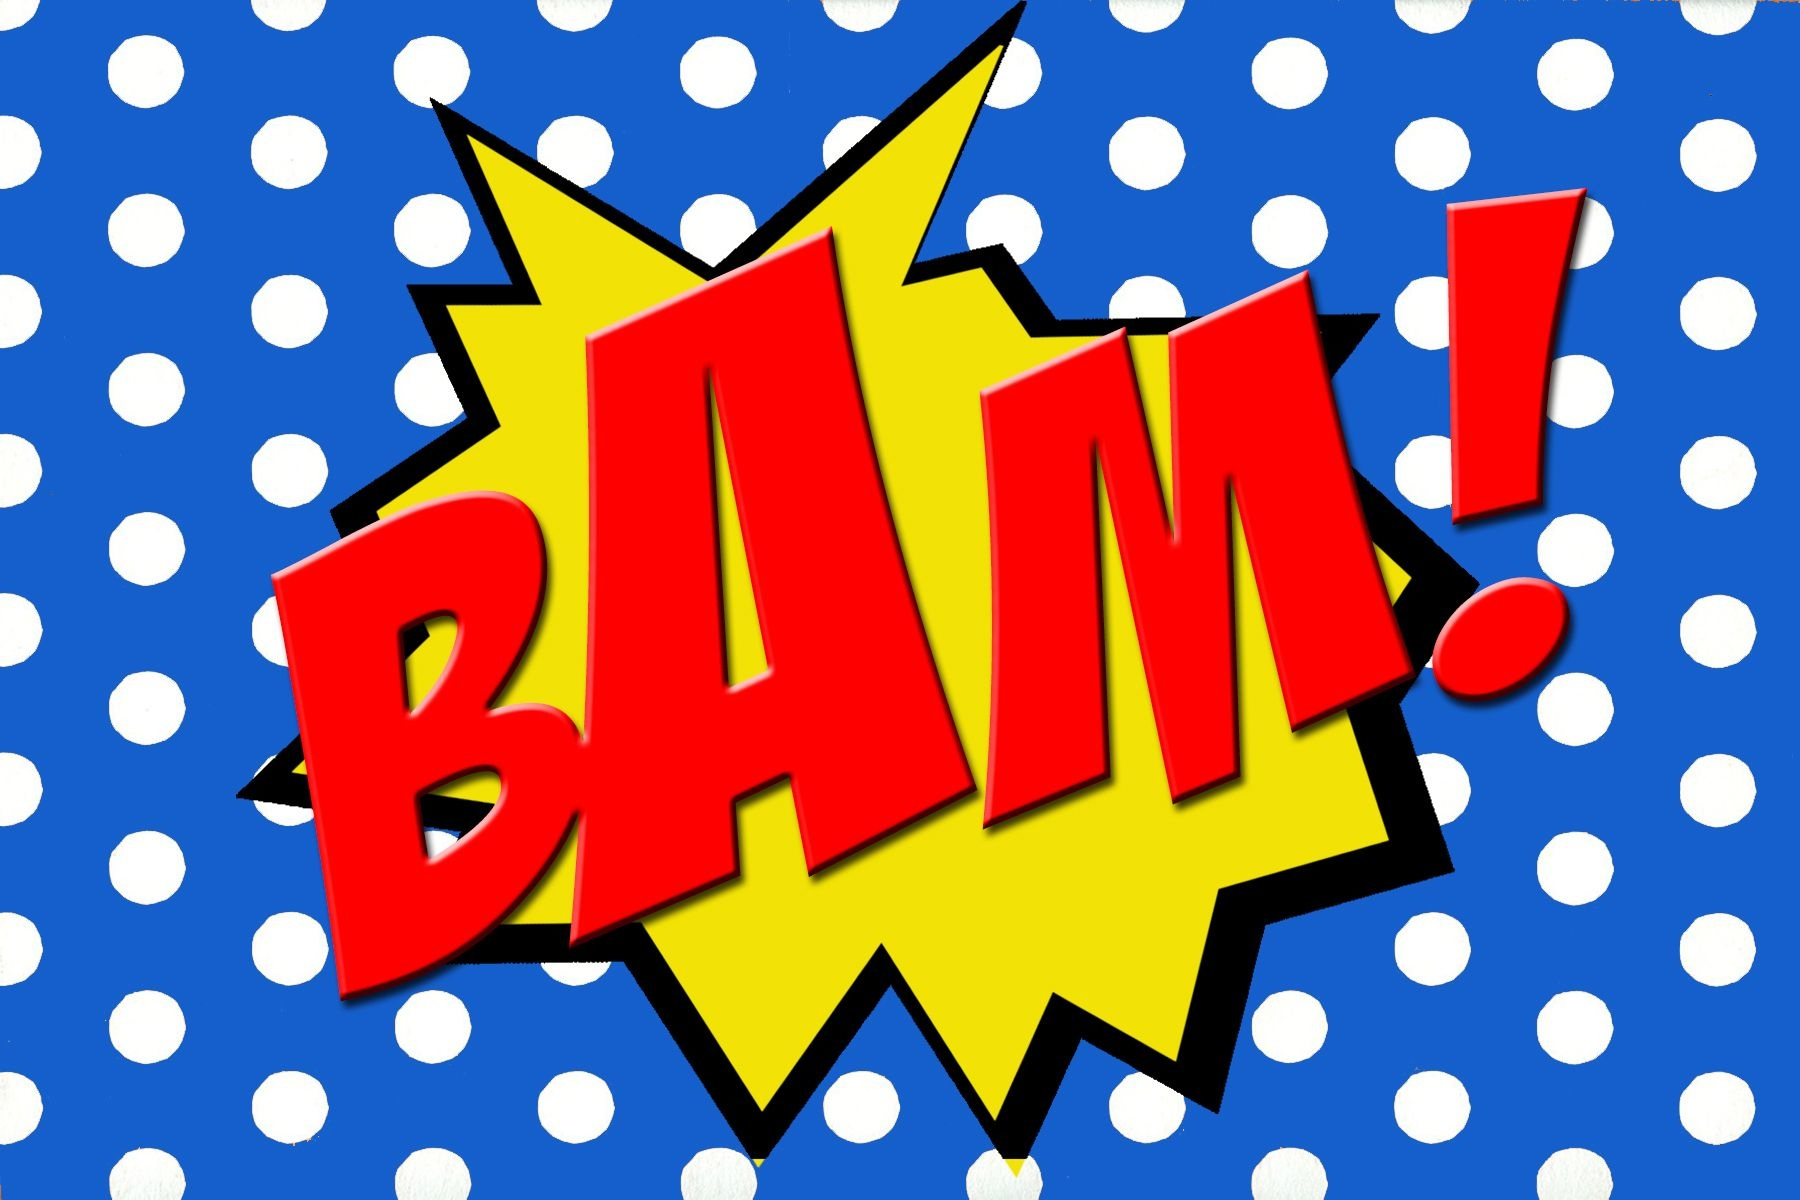 Free Printable Bam! Comic Book Word. | Super Hero Party | Superhero - Free Printable Superhero Words